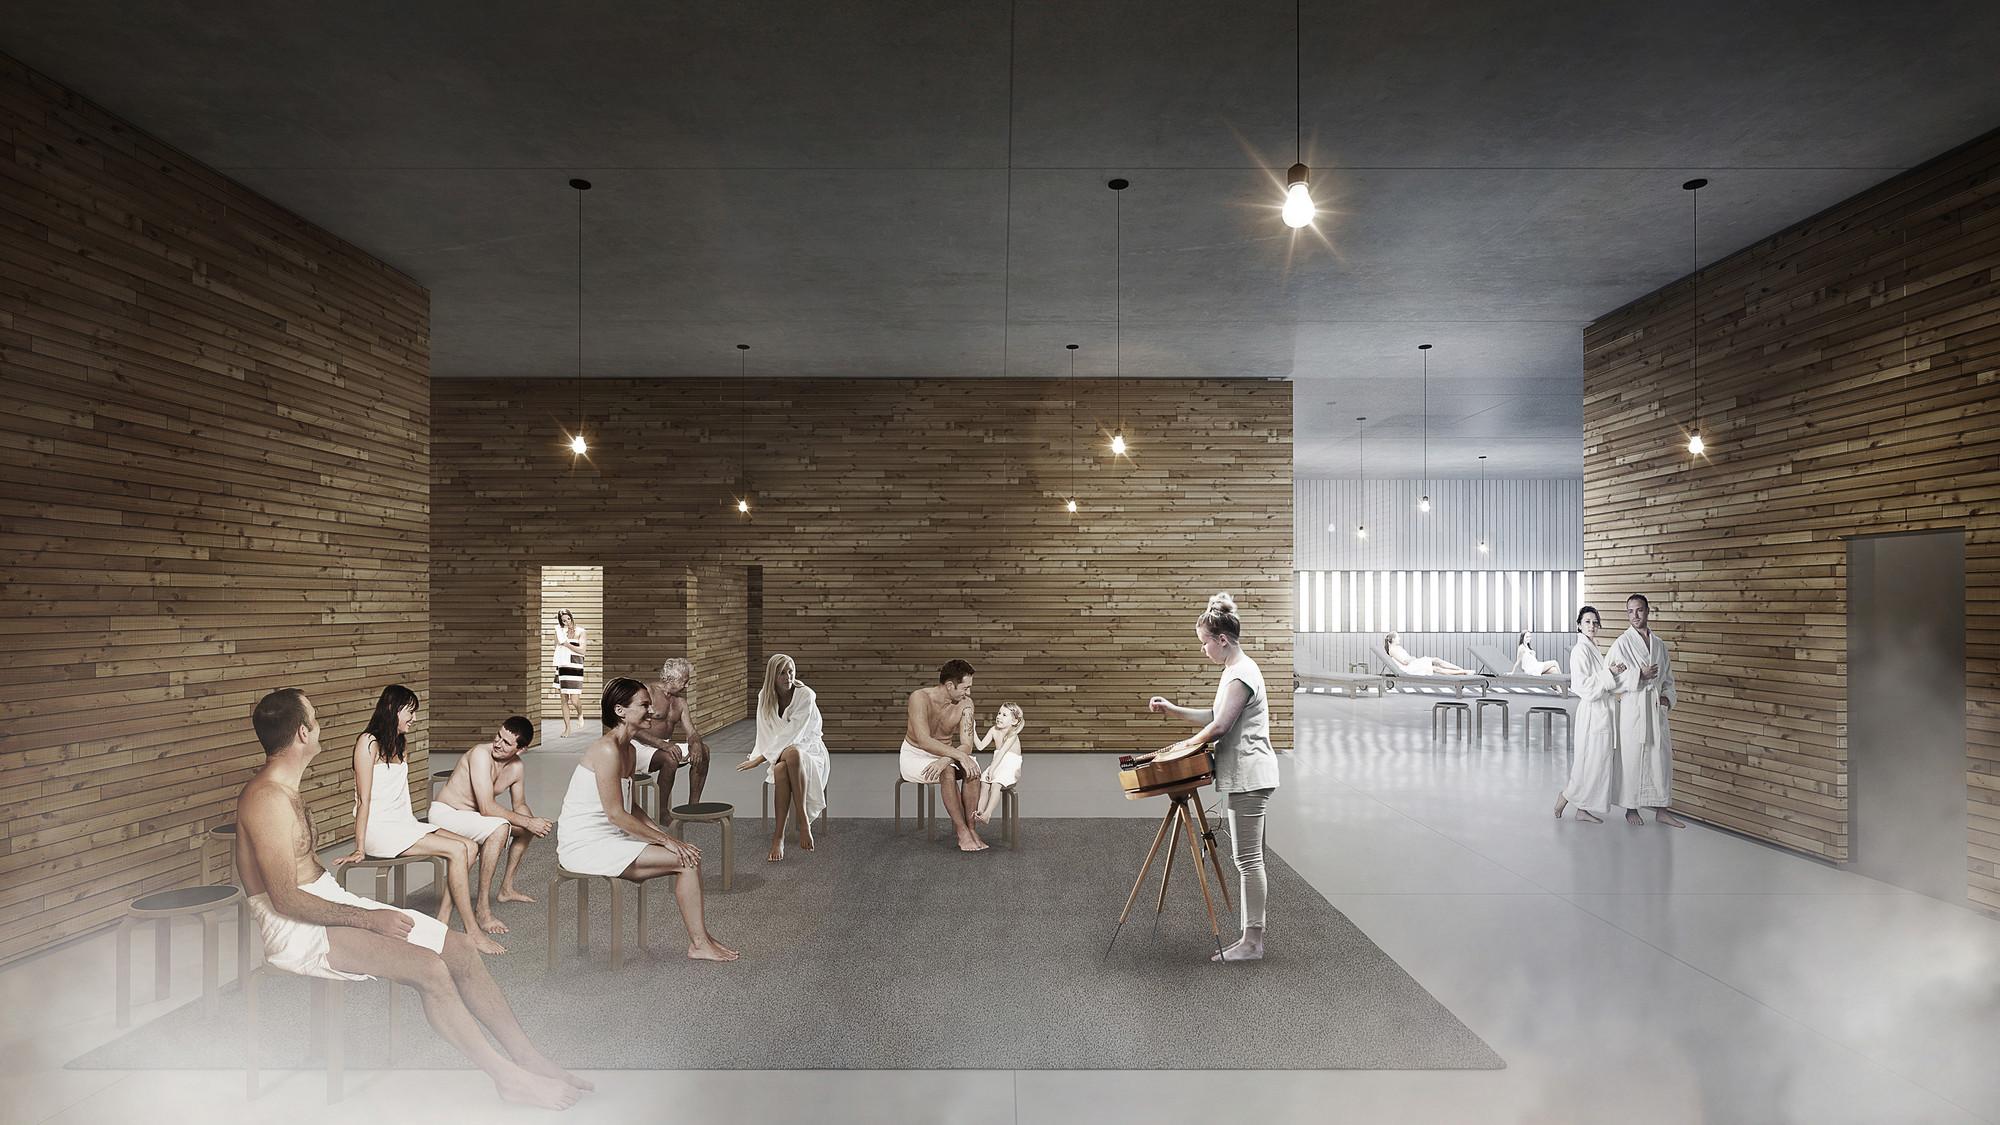 gallery of new images take you inside ala s helsinki central library 12. Black Bedroom Furniture Sets. Home Design Ideas